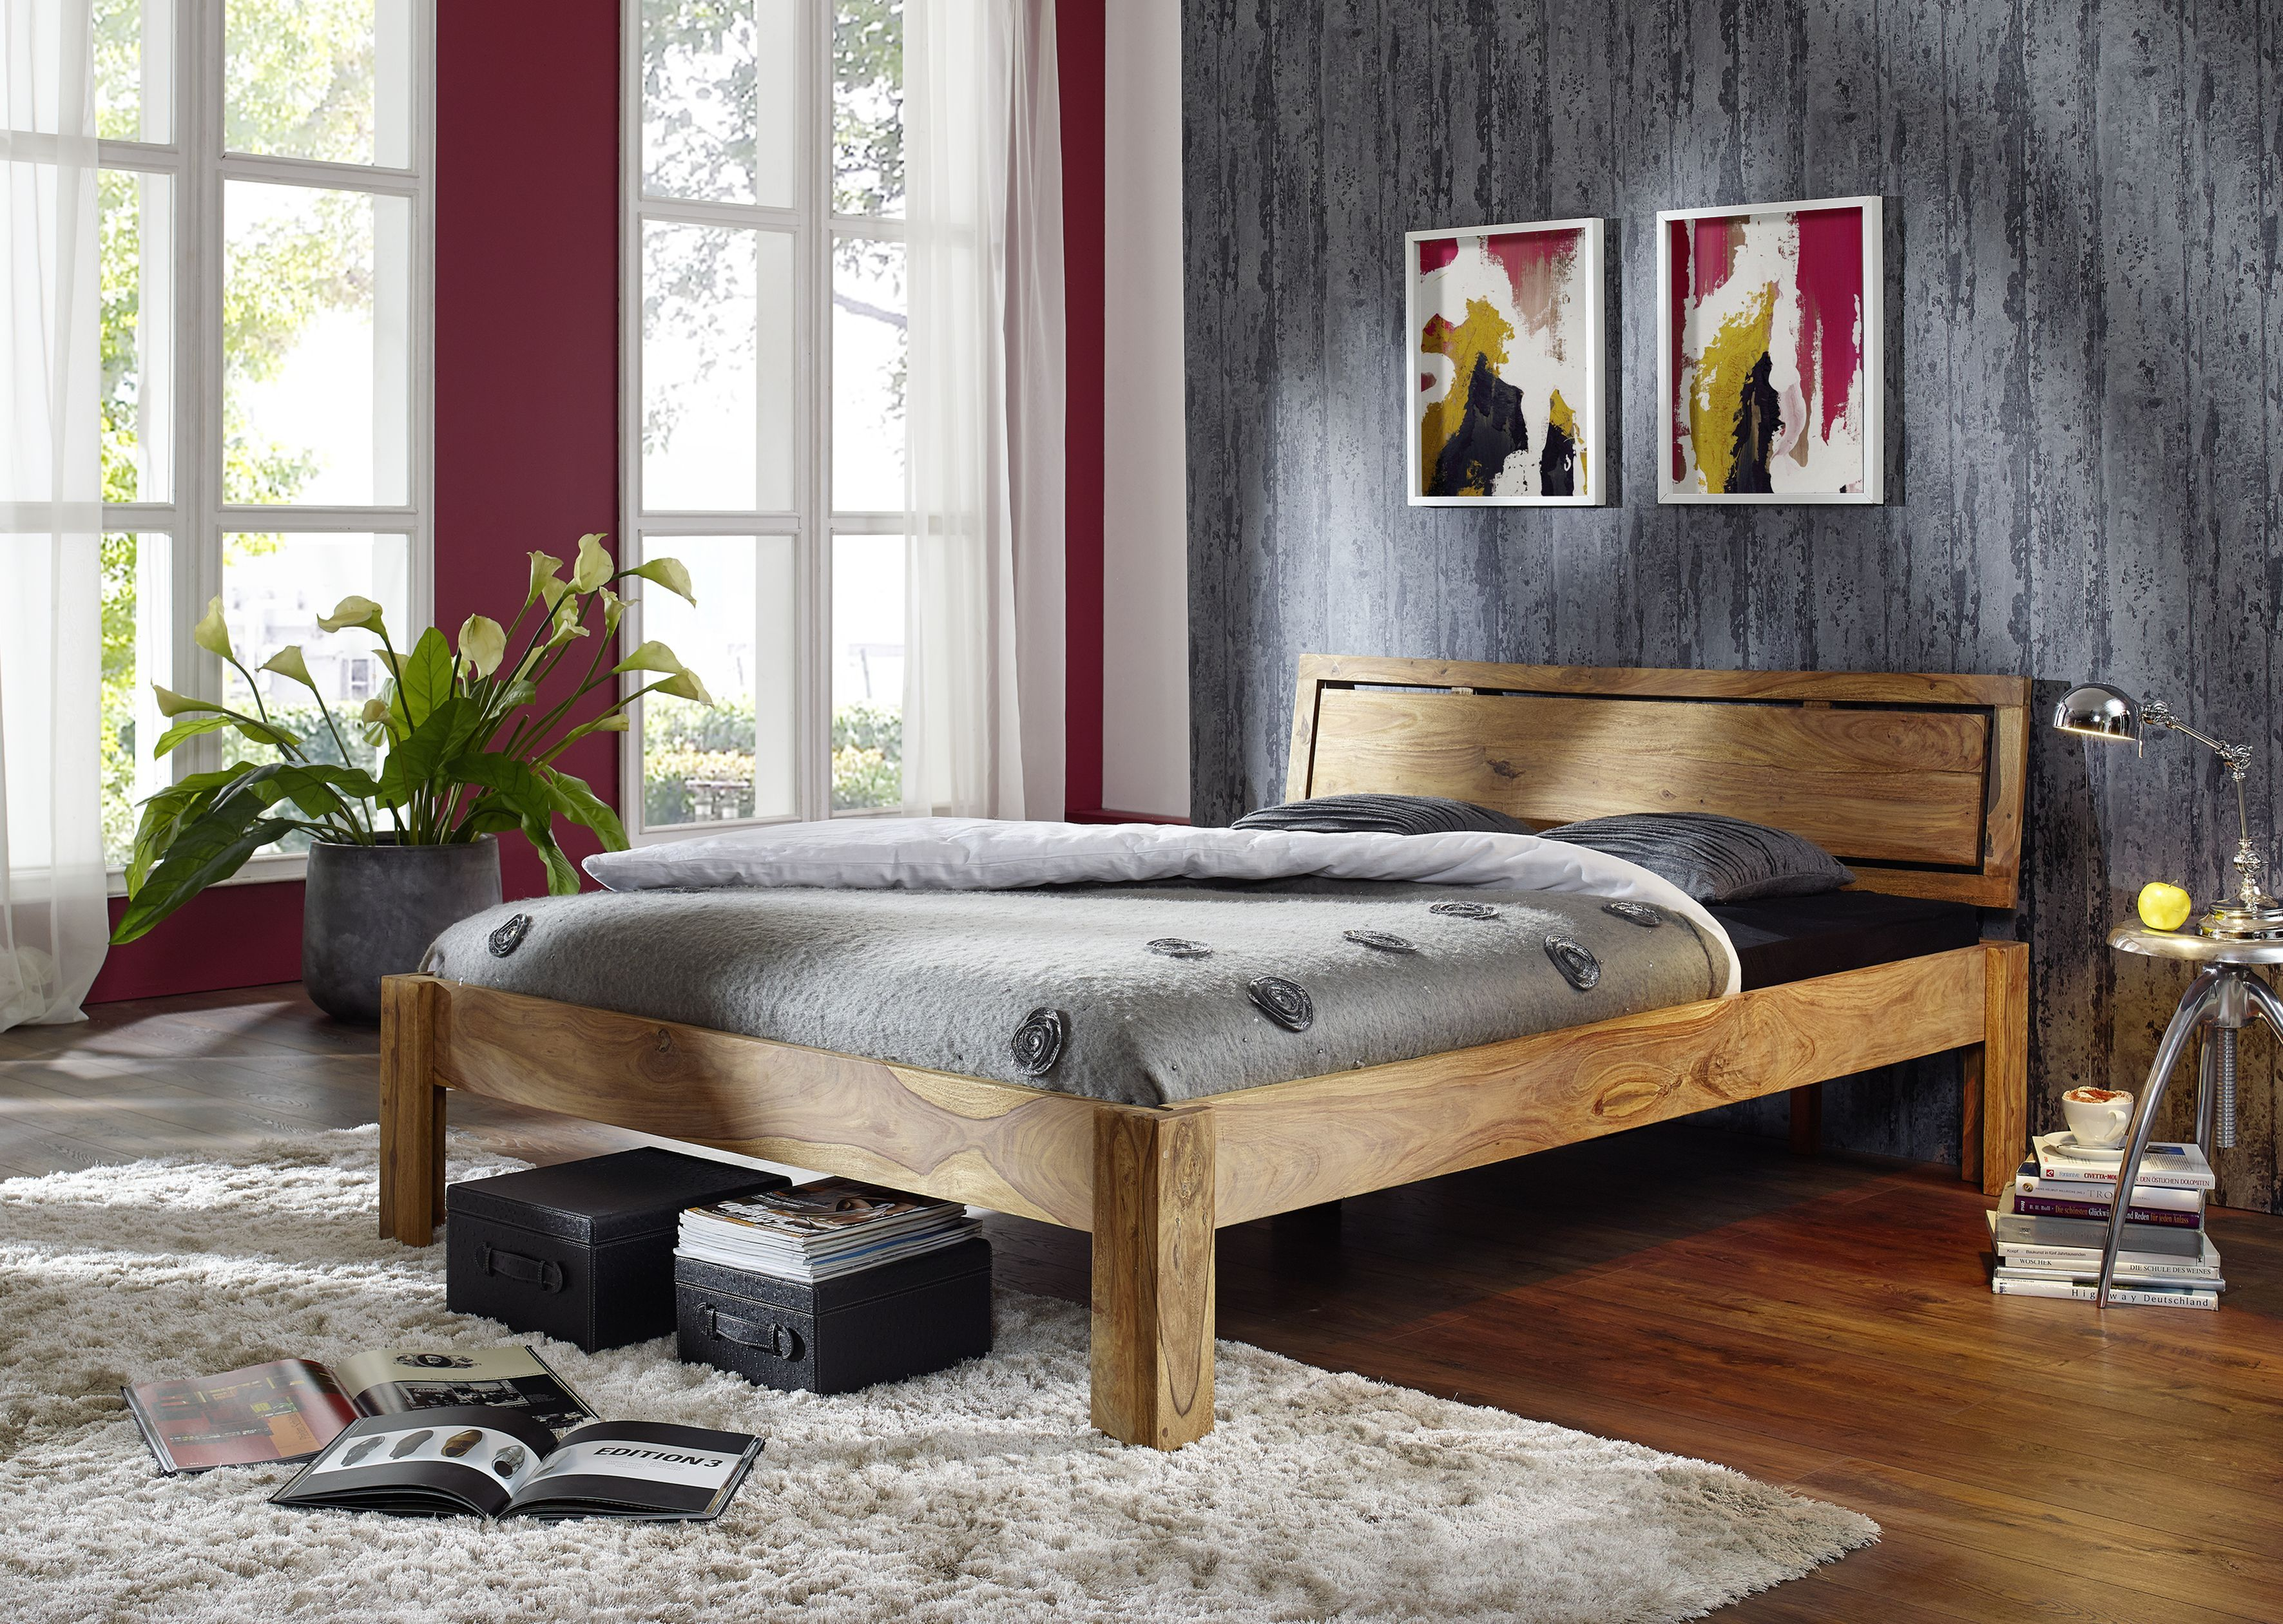 Schlafzimmermöbel Massivholz ~ Pin by adam suslowicz on bett aus massivholz pinterest